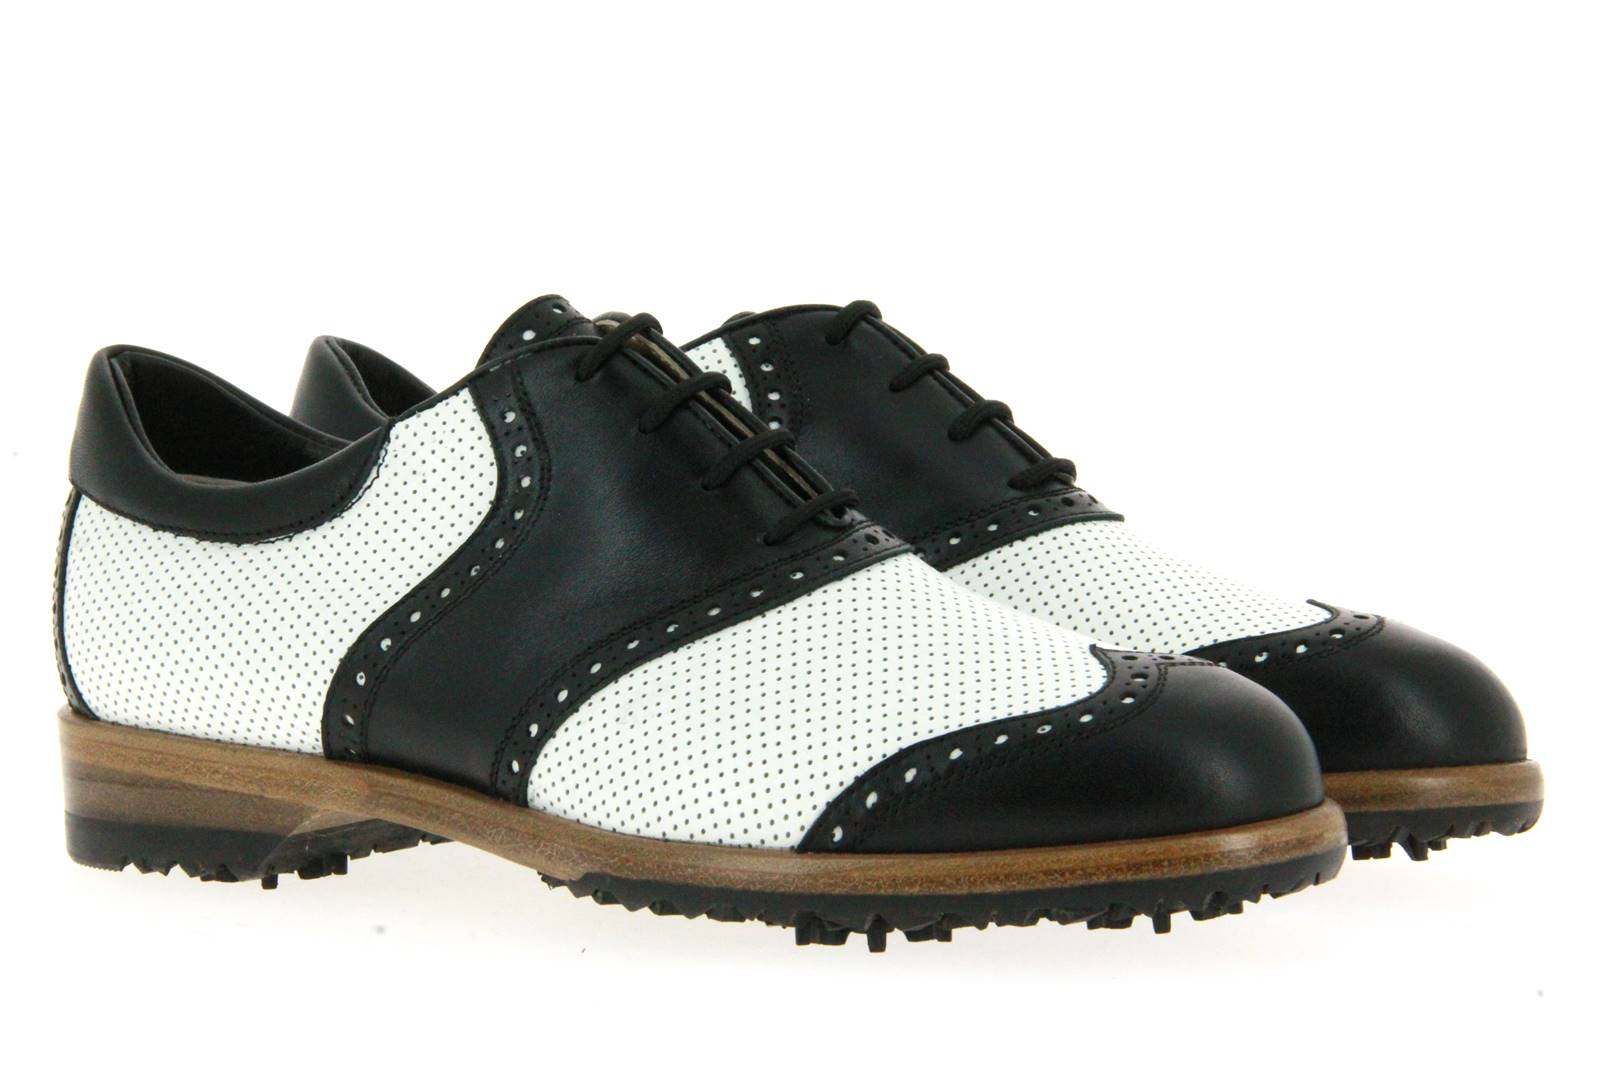 Tee Golf Shoes Damen- Golfschuh SUSY PERFORATO BIANCO NERO (40)